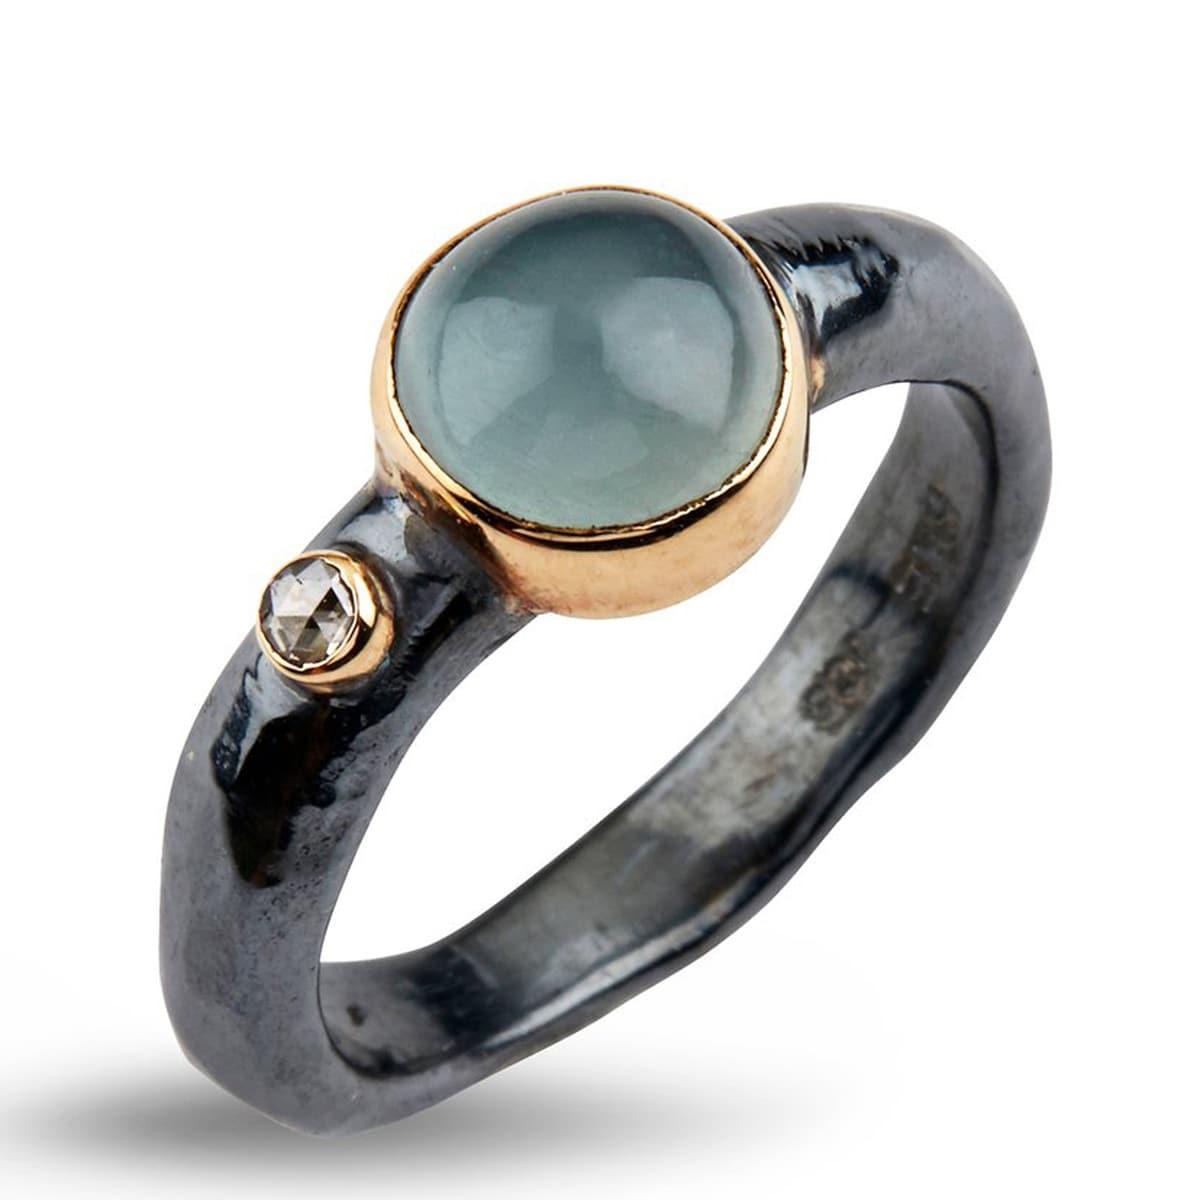 50110204A_Ring_Antique_Aqua_ByBirdie_jarl_sandin